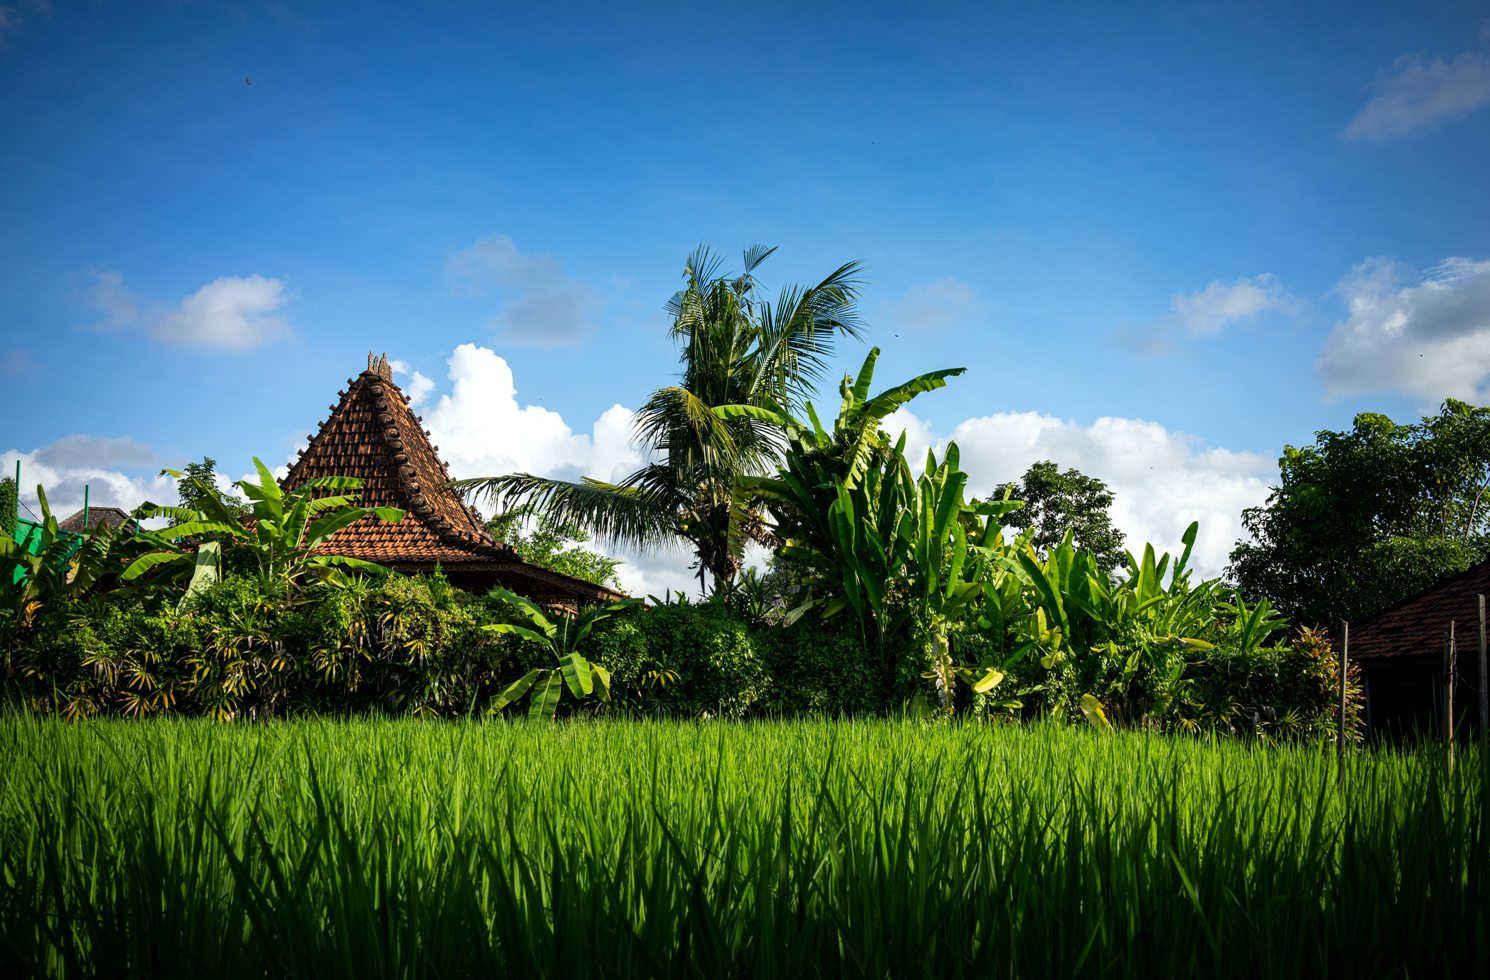 Jalan Penestanan Kelod, Sayan, Ubud, Gianyar, Bali, Indonesien